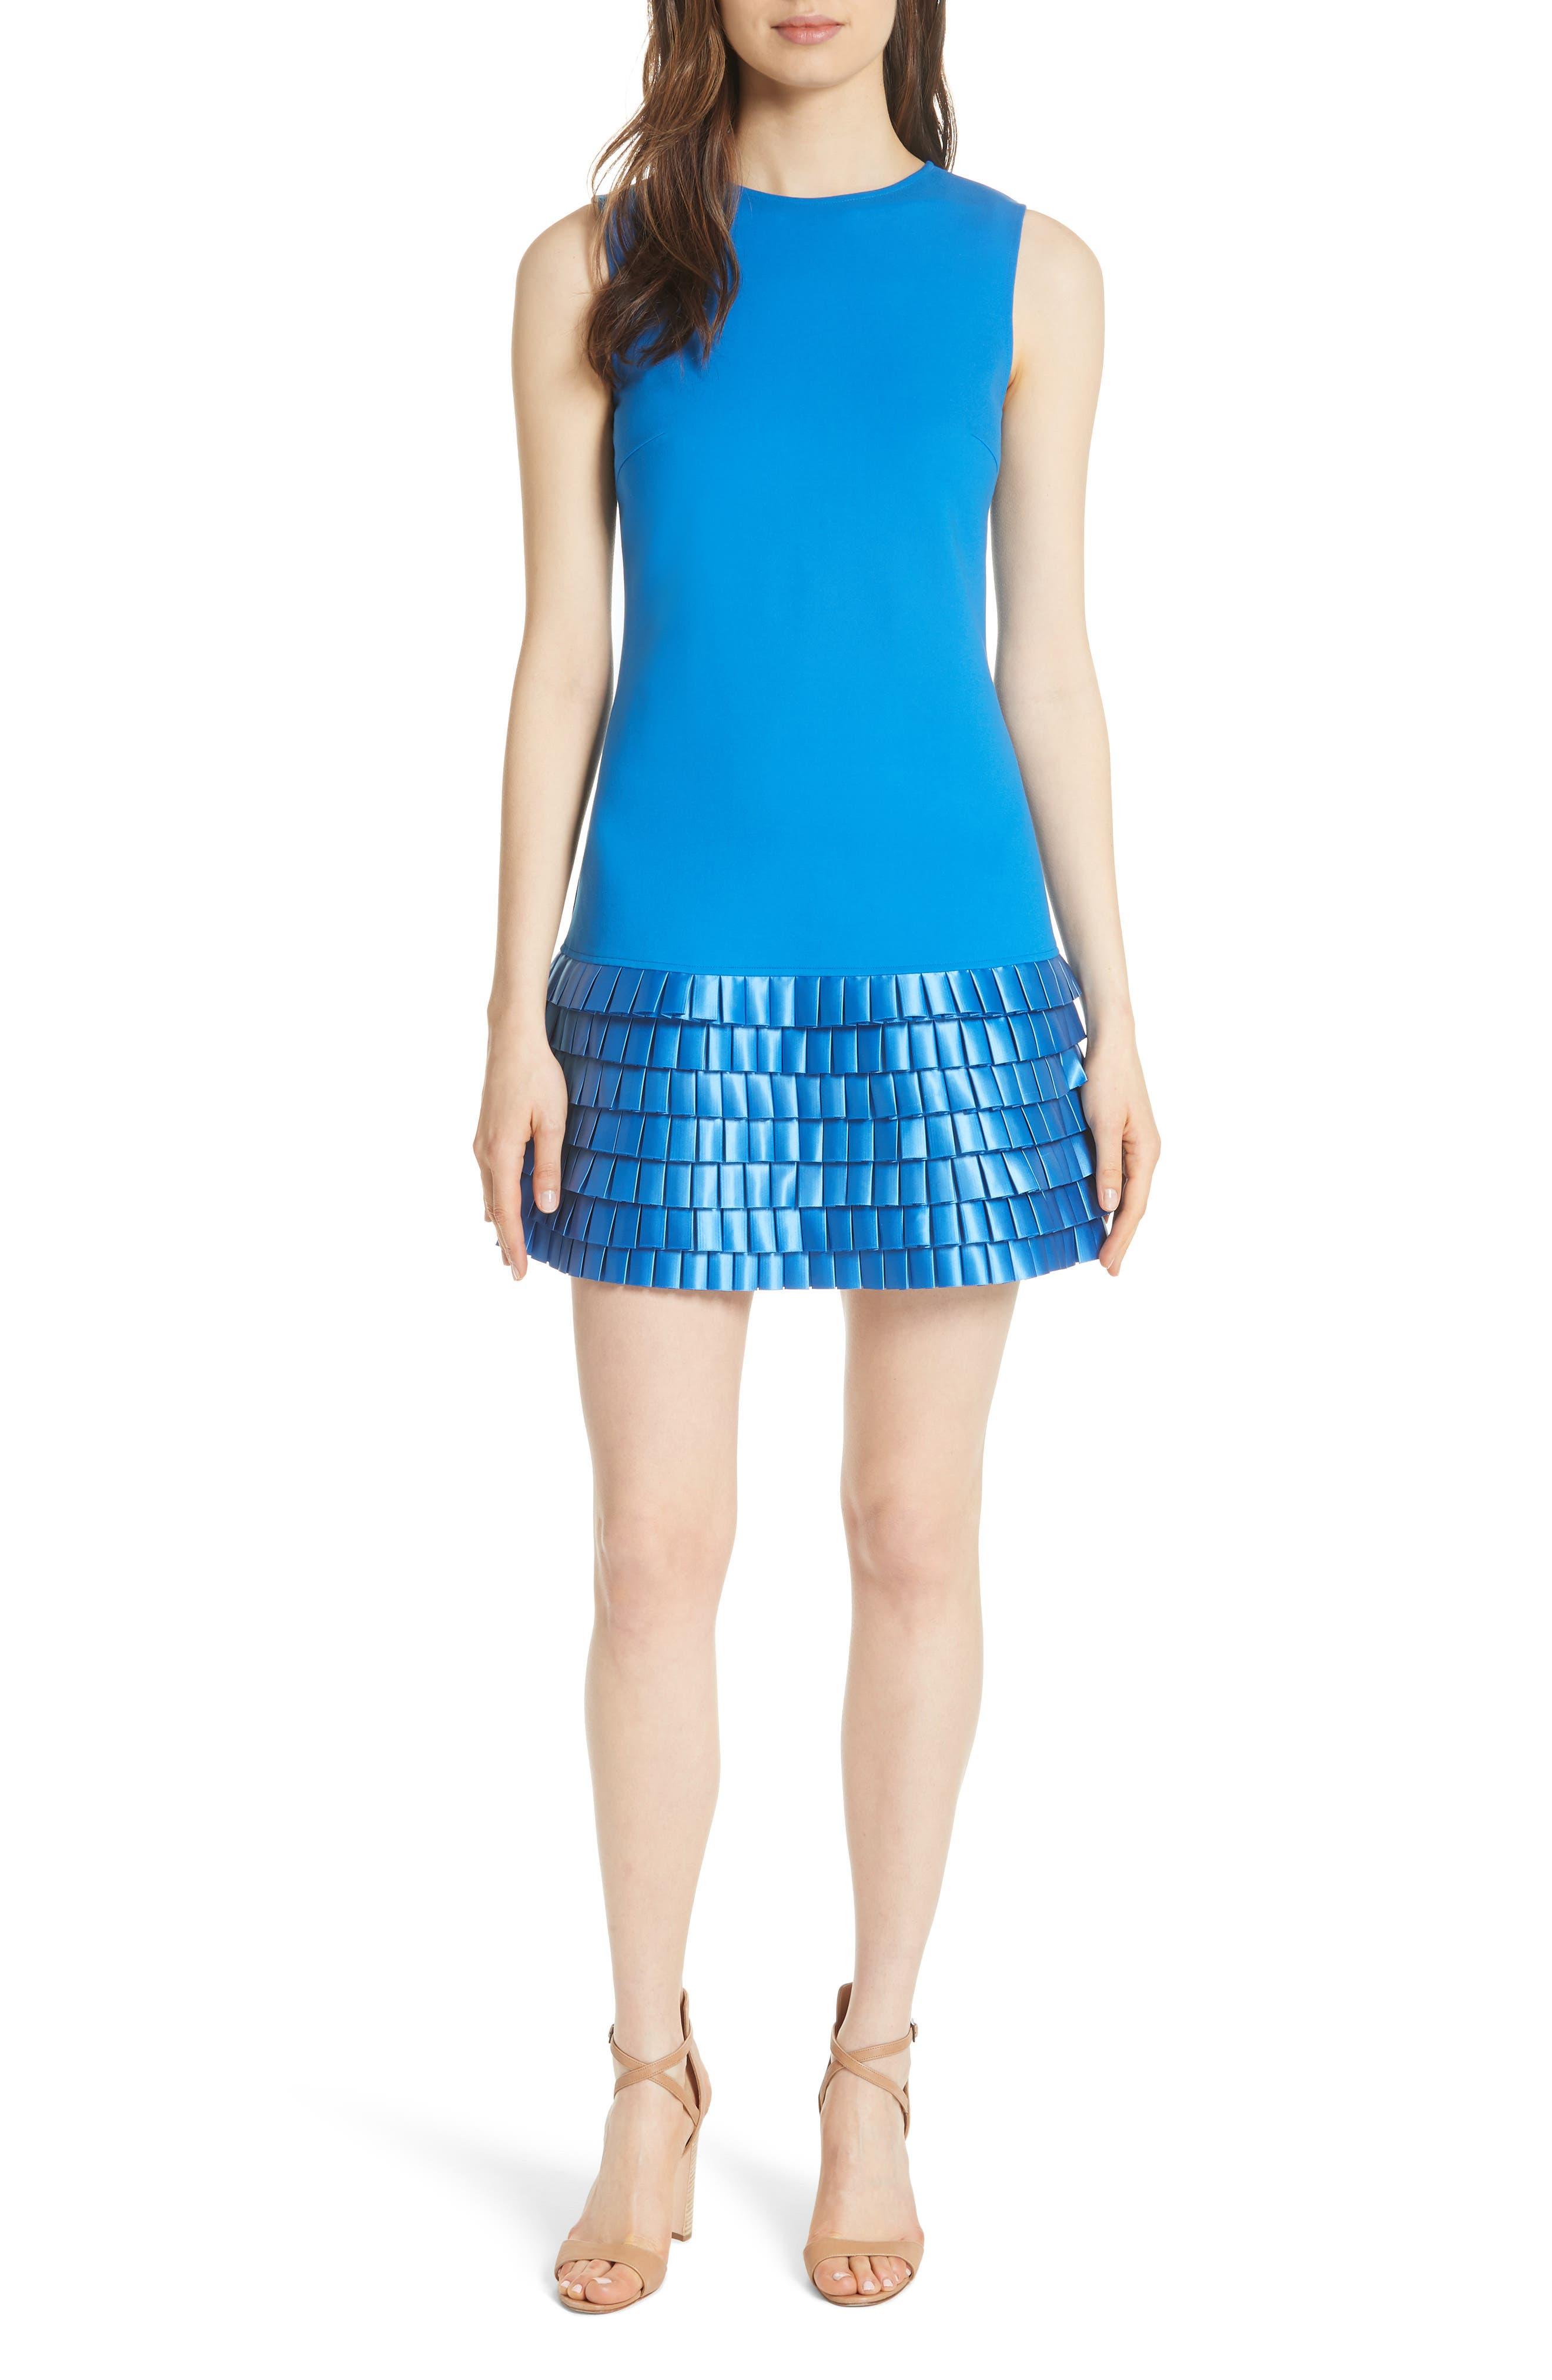 Marggia Satin Loop Detail Shift Dress,                             Main thumbnail 1, color,                             430